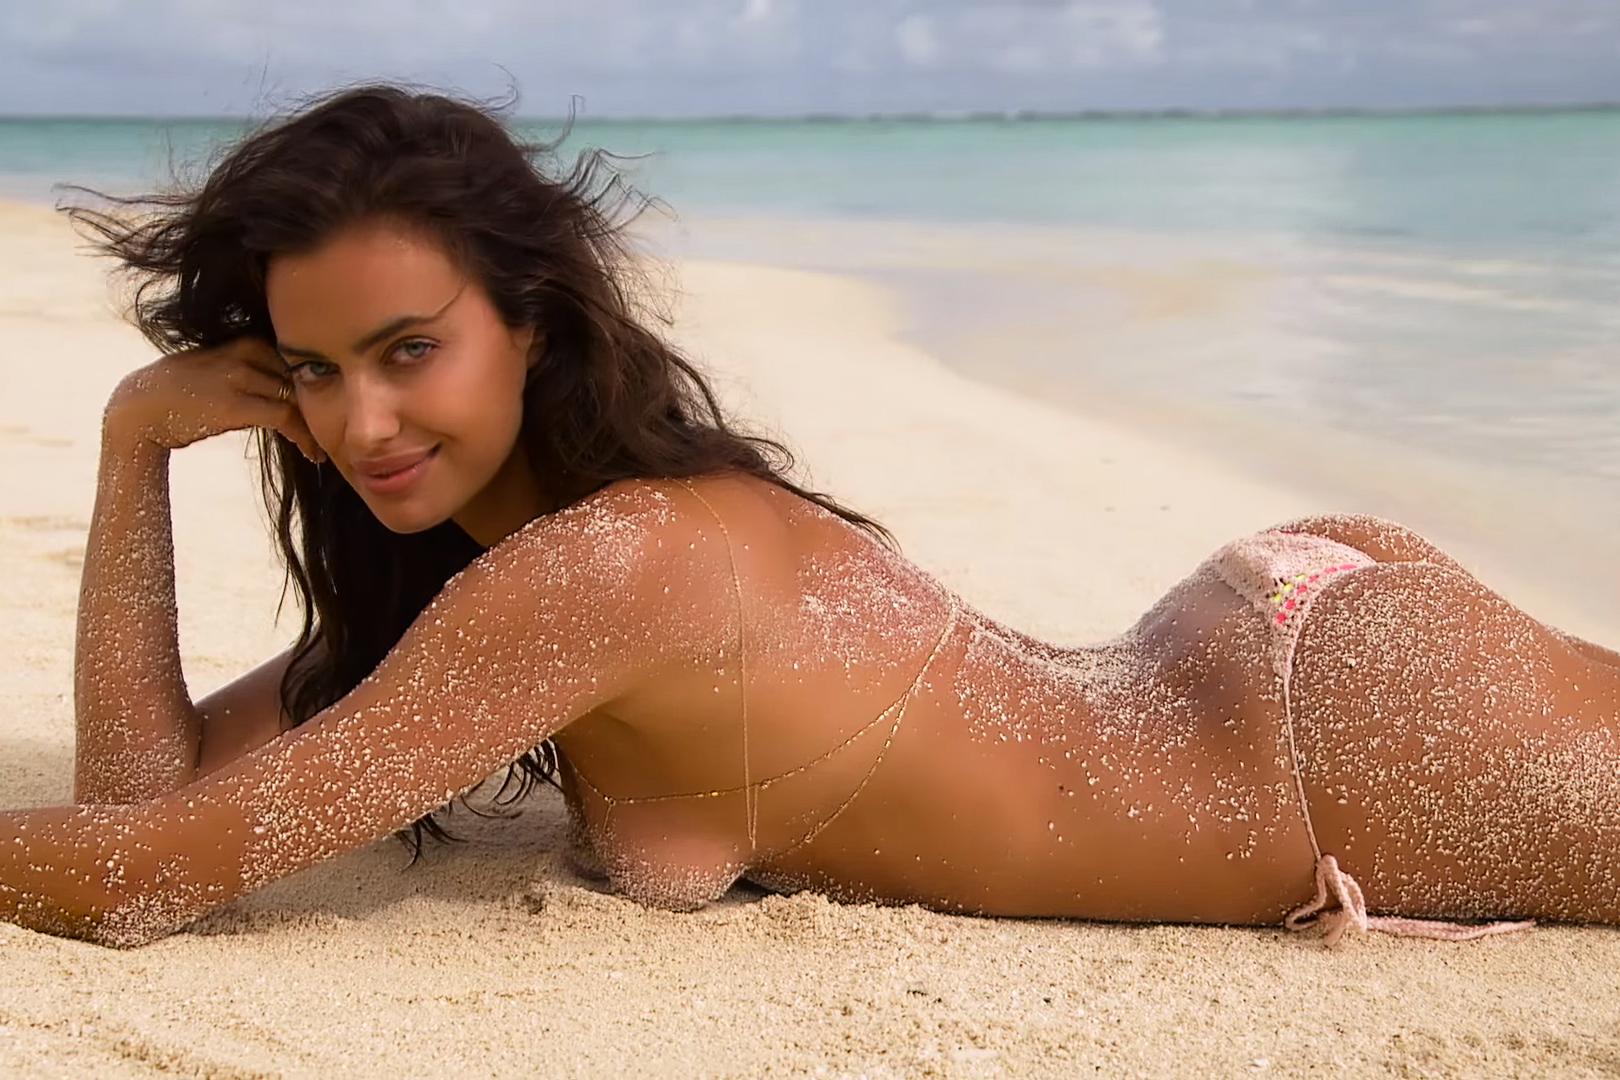 Watch Behind-the-Scenes Footage of Irina Shayk's 'Sports Illustrated' Photoshoot